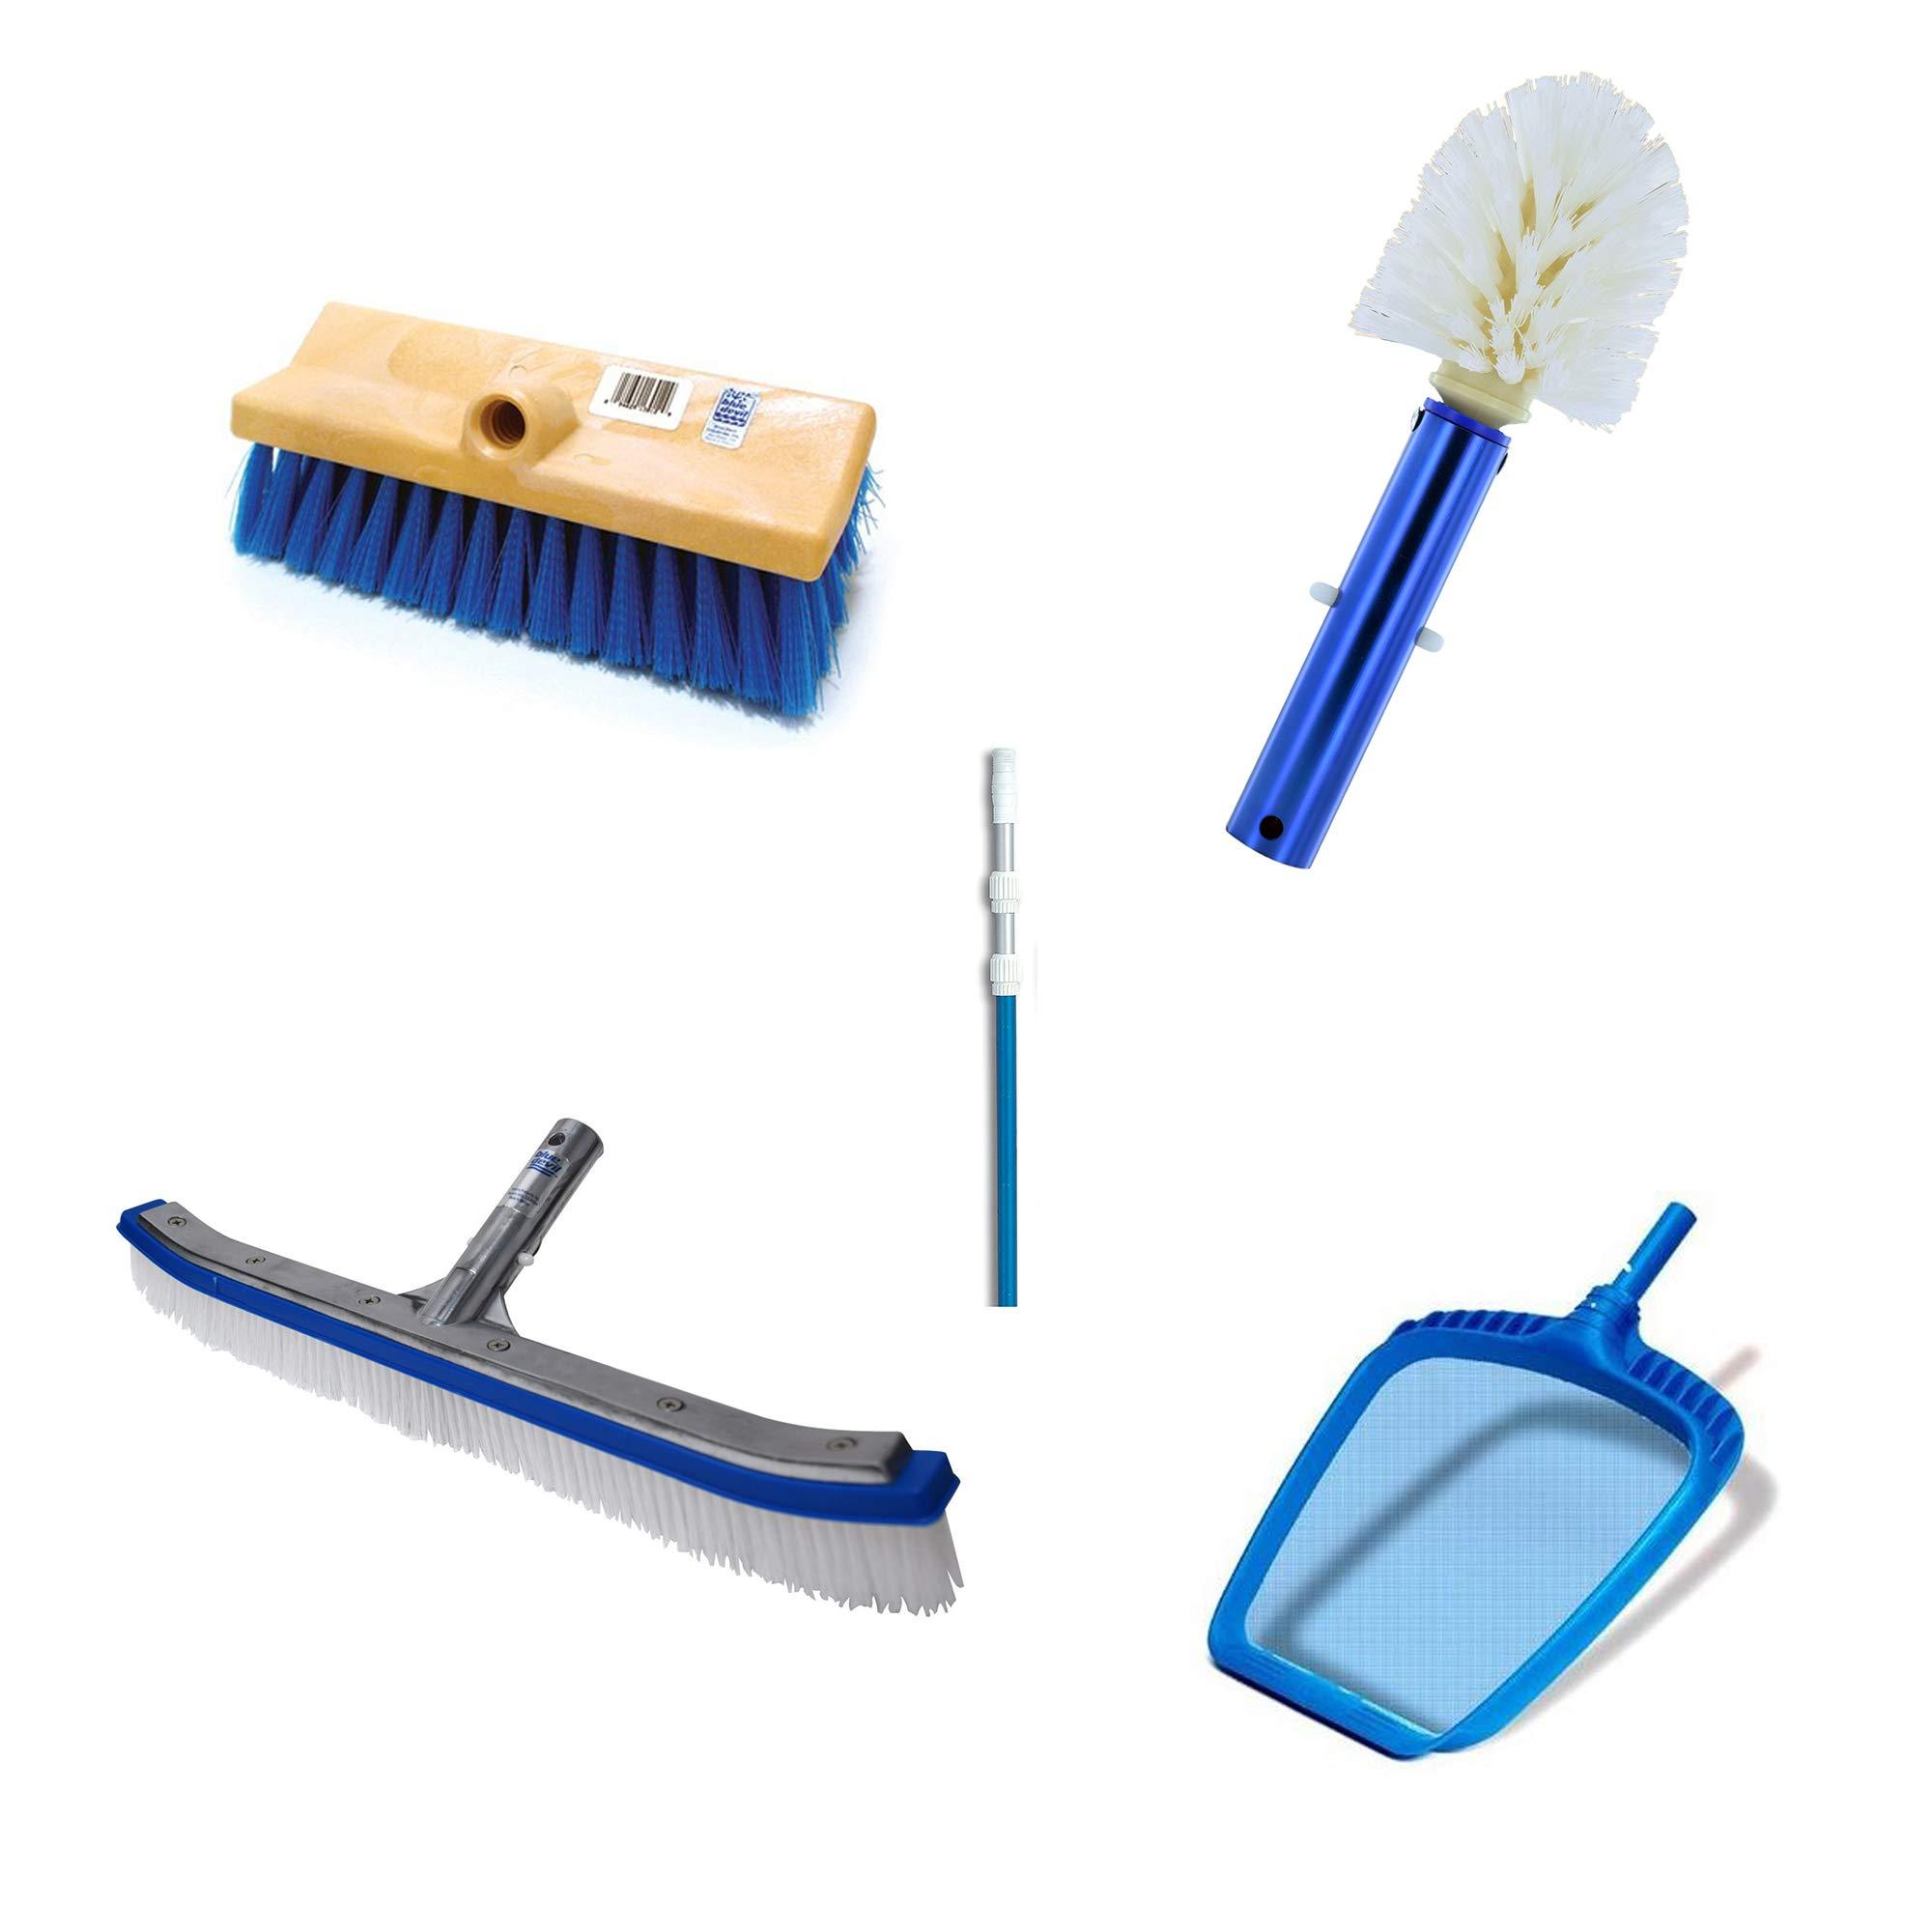 Blue Devil 18 Inch Brush, 360 Brush, Deck N Acid Brush, HydroTools Pole and Net by Blue Devil